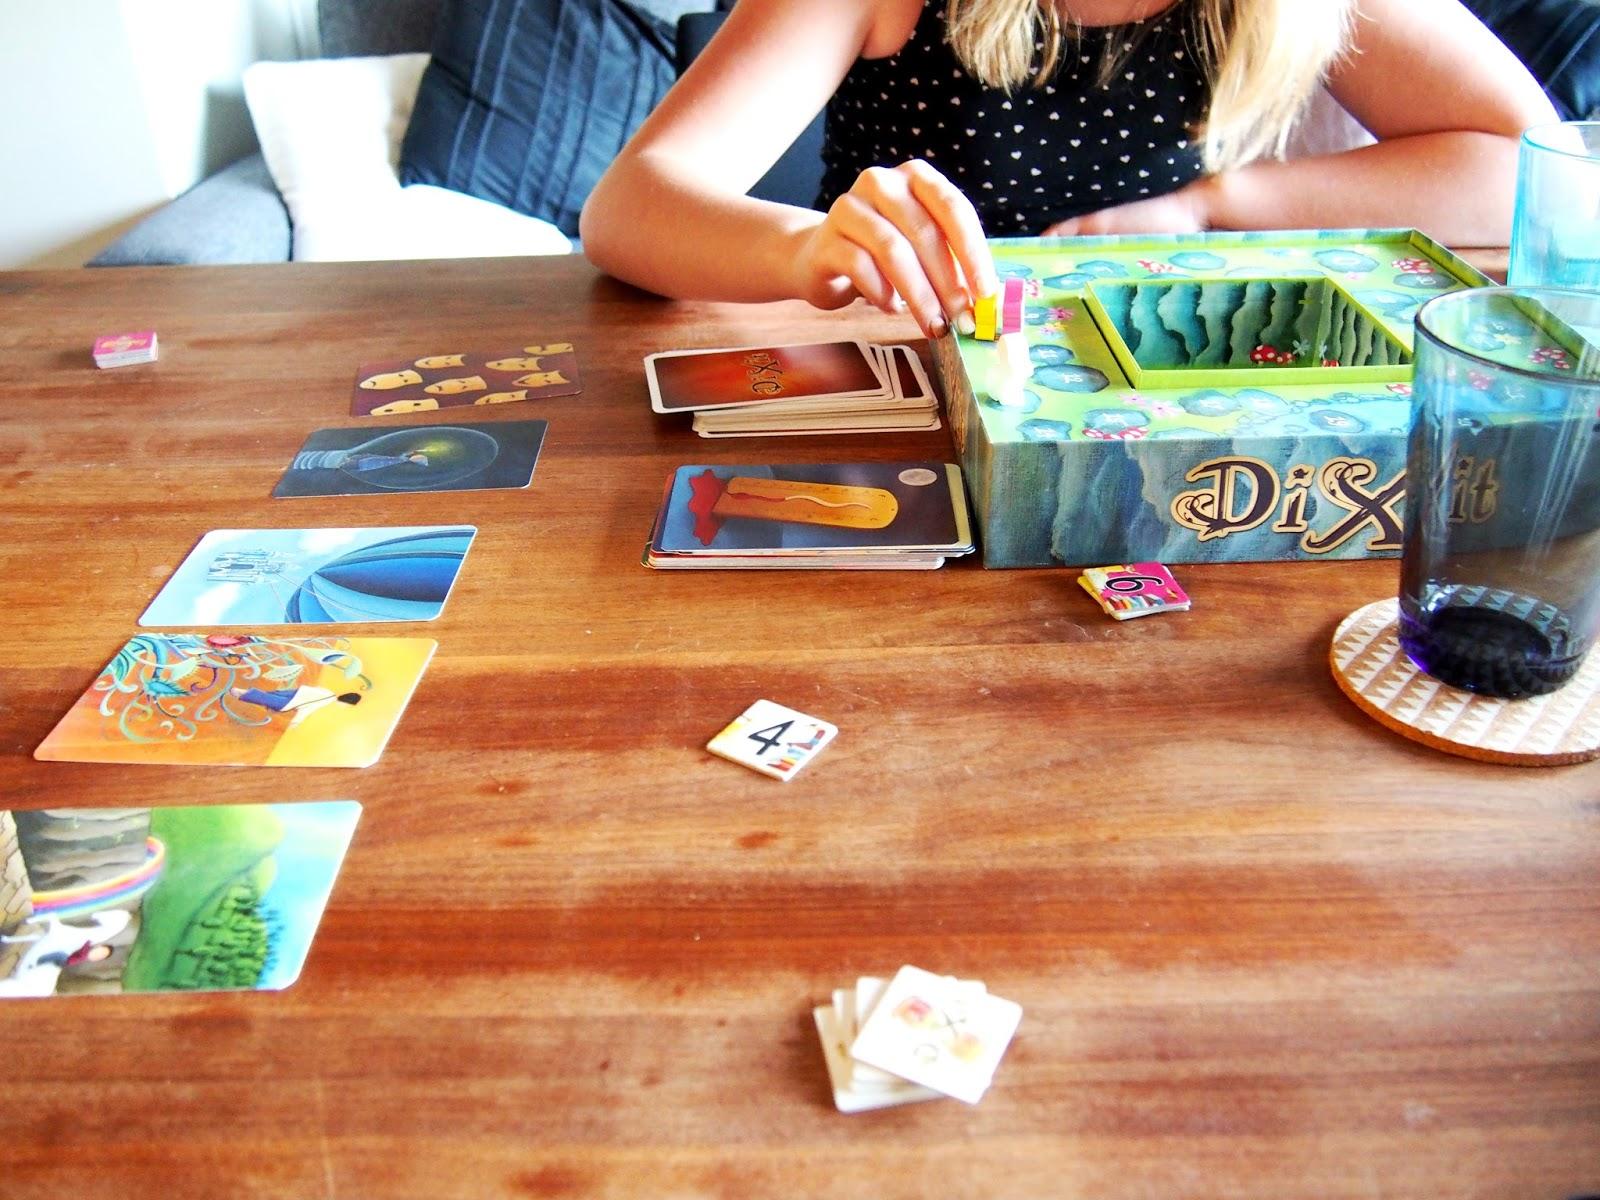 #duxit #board #game #night #evening #playing #lauta #peli #pelata #peli-ilta #kids #fun #storys #tarina